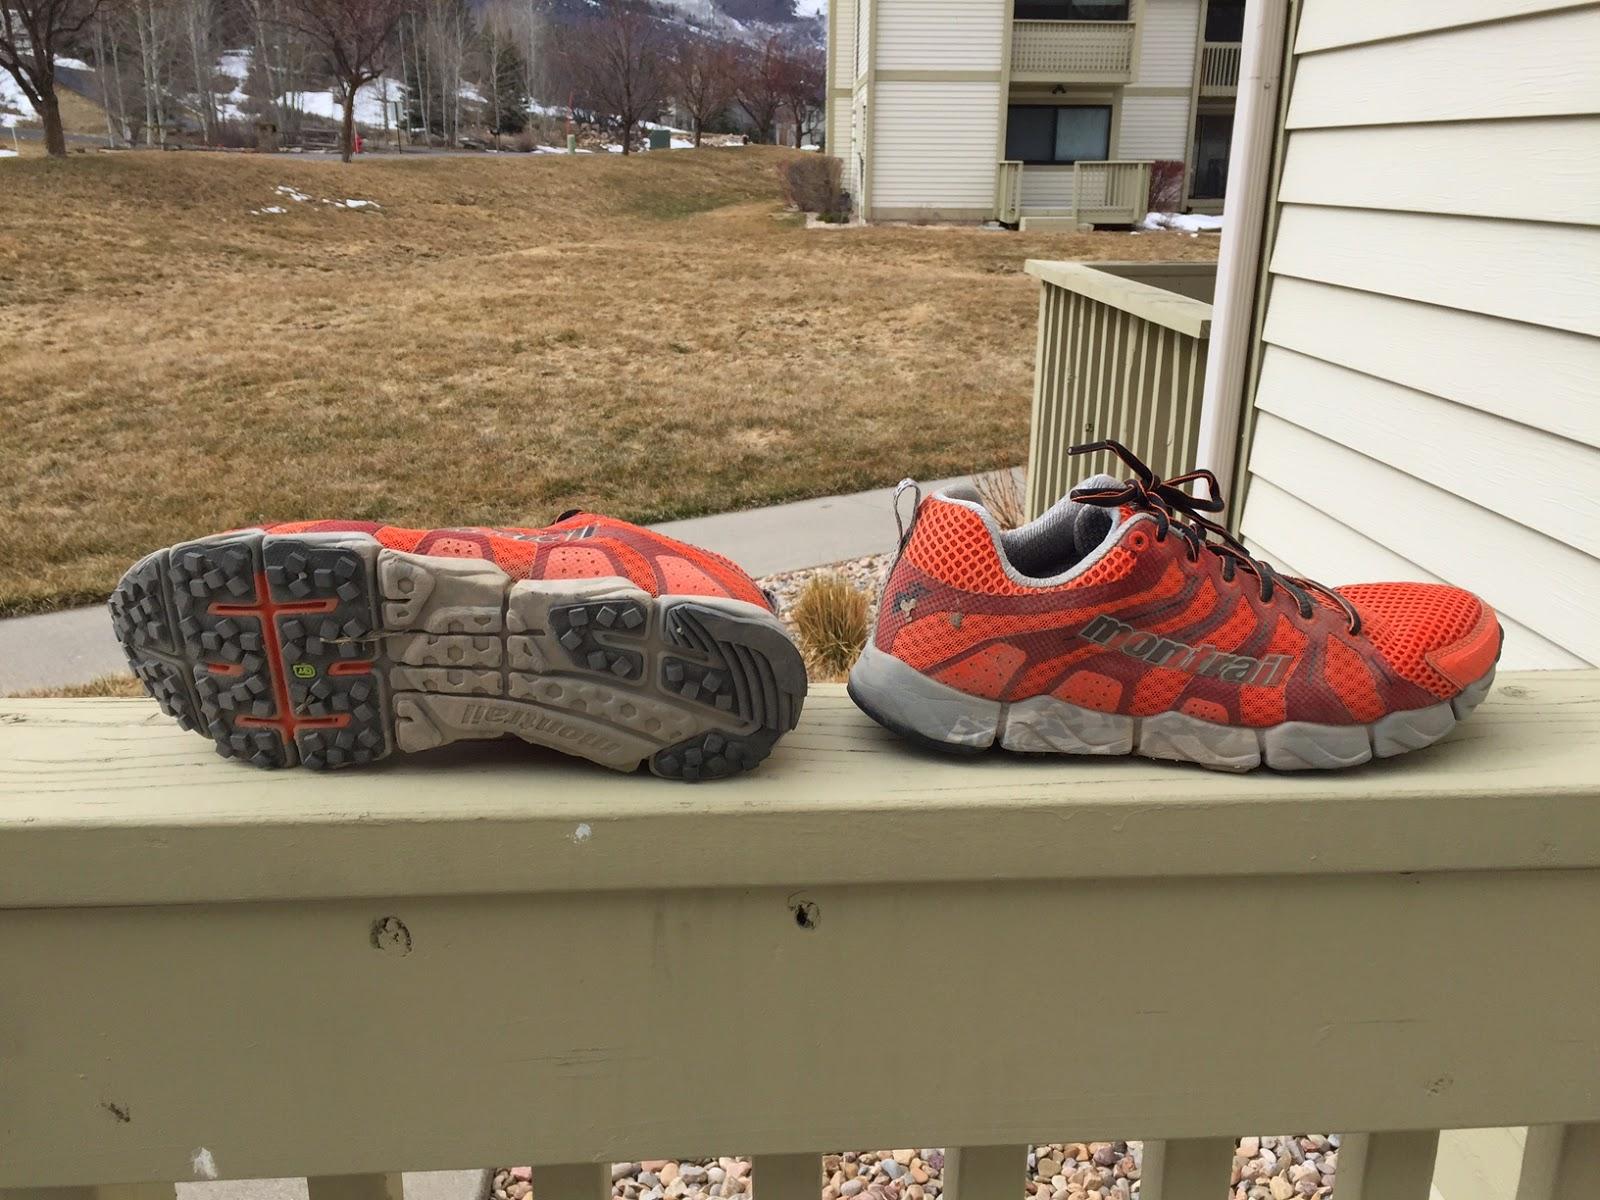 separation shoes 6226c 197c5 Road Trail Run Trail Shoe Roundup- Pre-Review First Runs Montrail  FluidFlex ST, adidas adizero XT Boost, adidas Adistar Raven Boost,  LaSportiva Mutant, ...